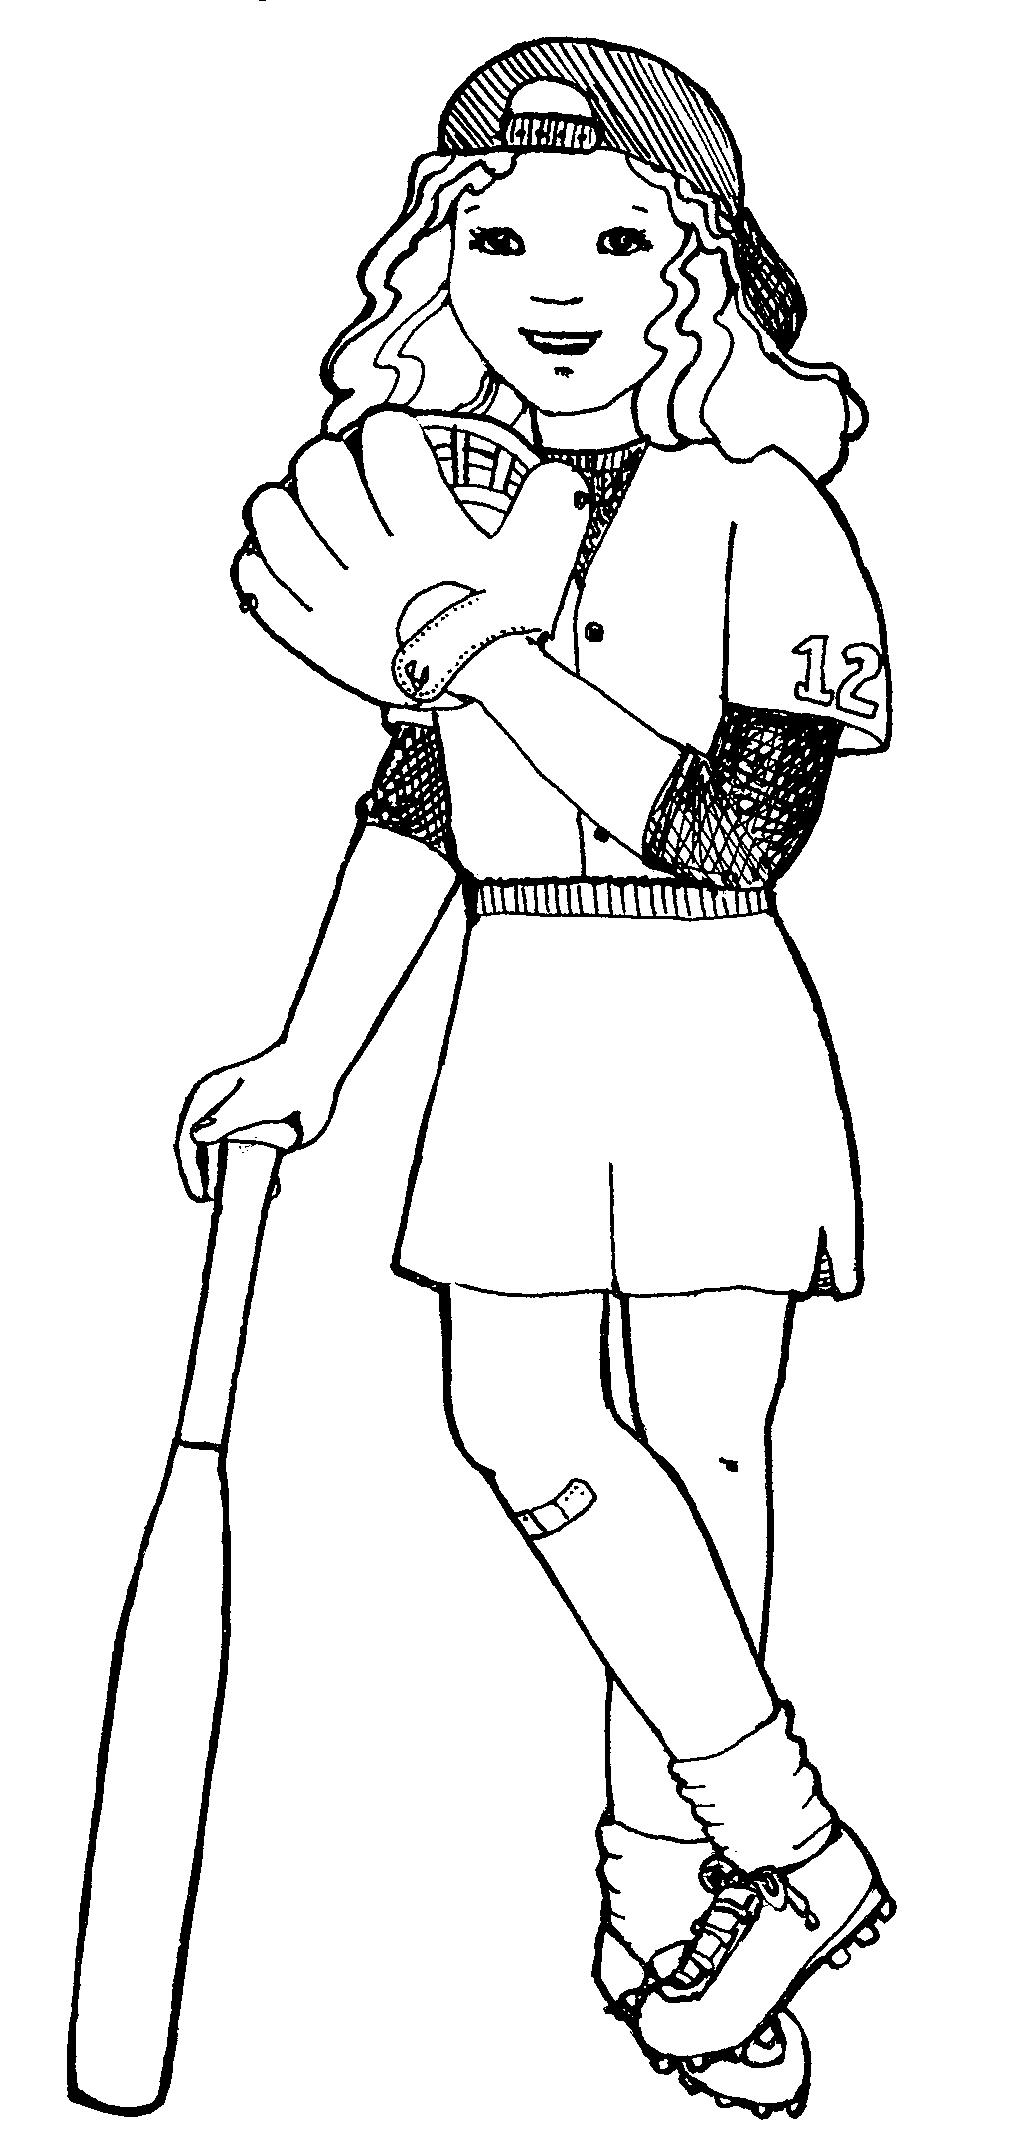 Clipart Softball Girl.